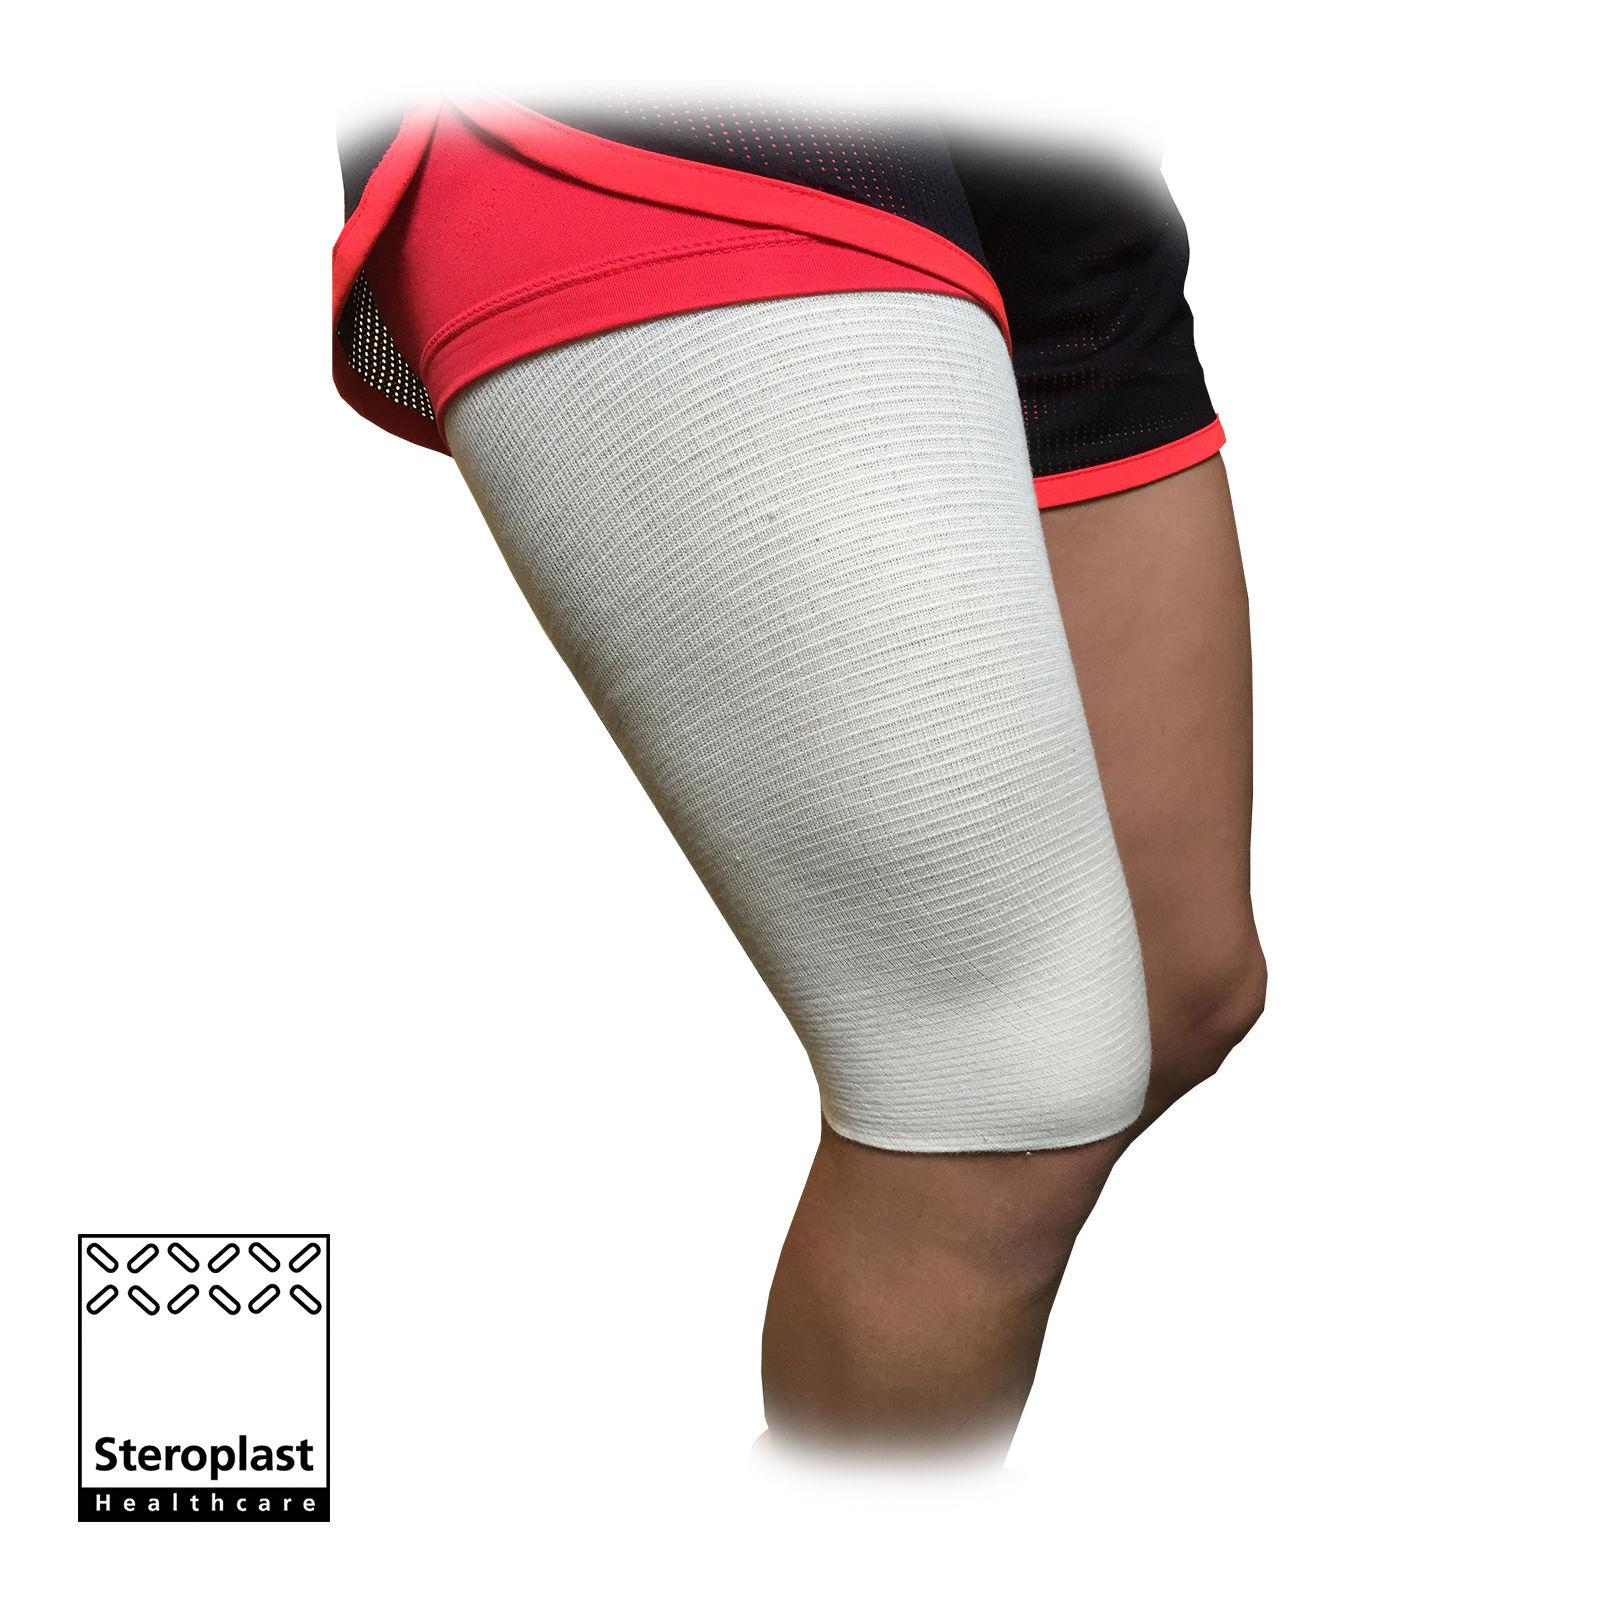 how to break or sprain your knee